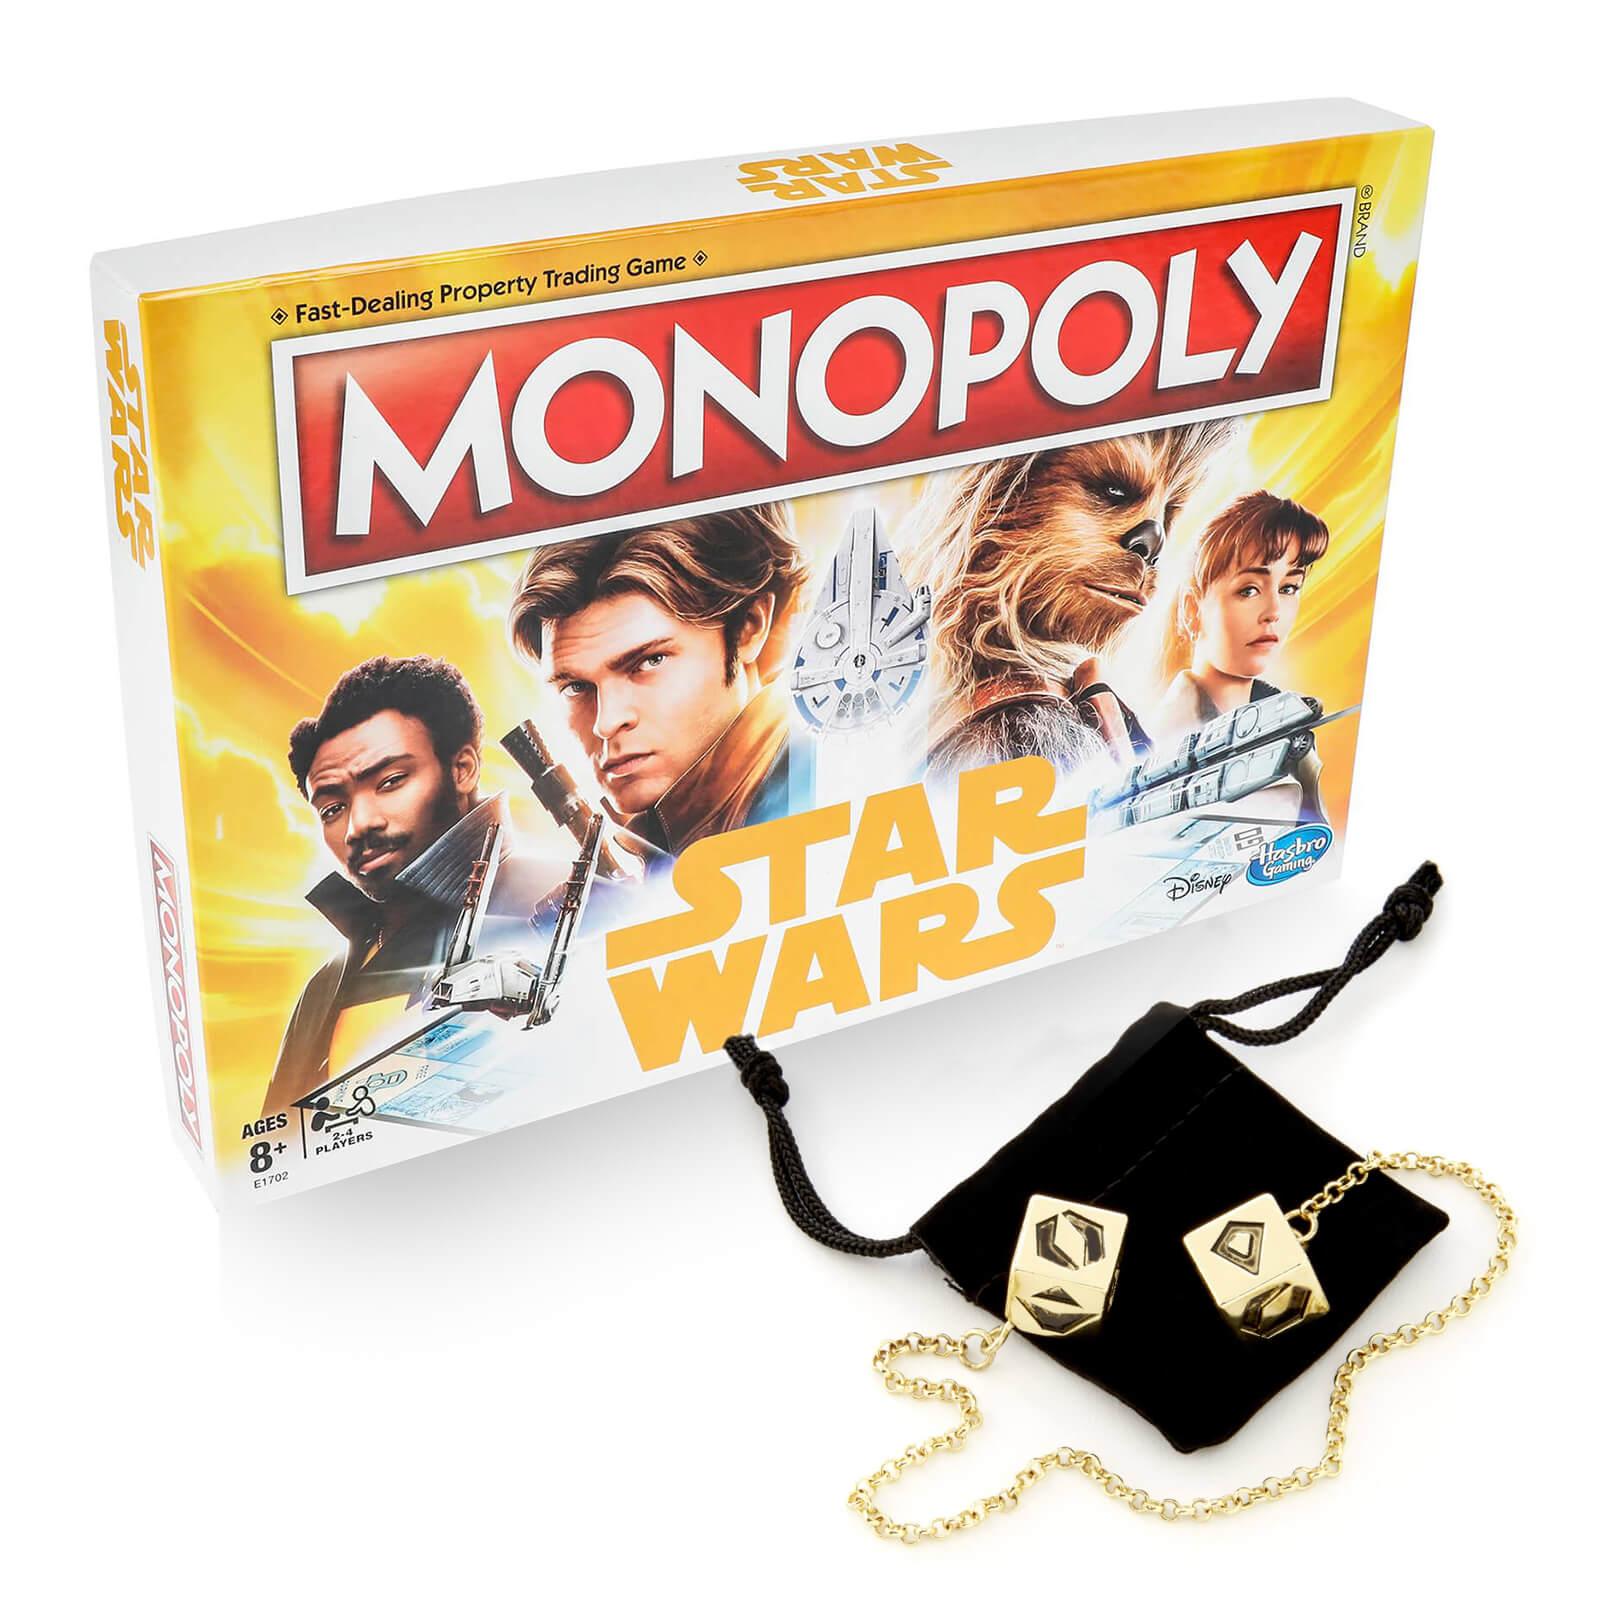 Star Wars Monopoly + Han Solo dobbelstenen voor €22,99 @ Zavvi